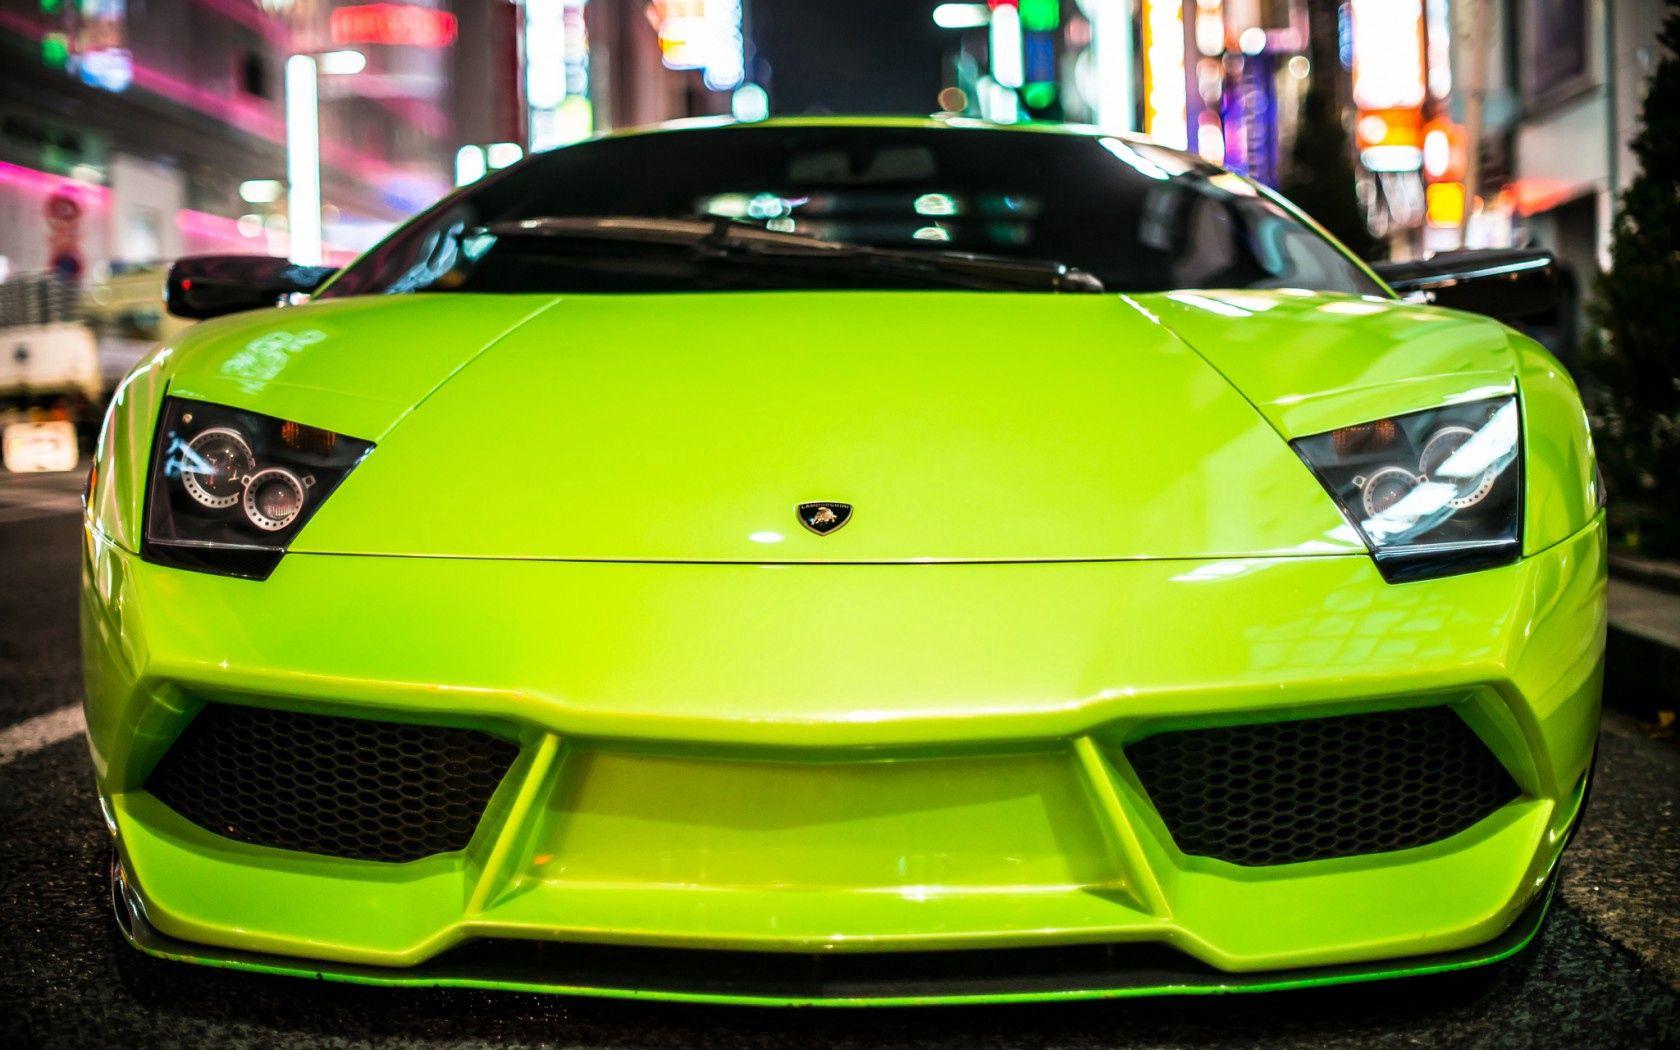 127283 Заставки и Обои Фары на телефон. Скачать Ламборджини (Lamborghini), Тачки (Cars), Машина, Фары картинки бесплатно